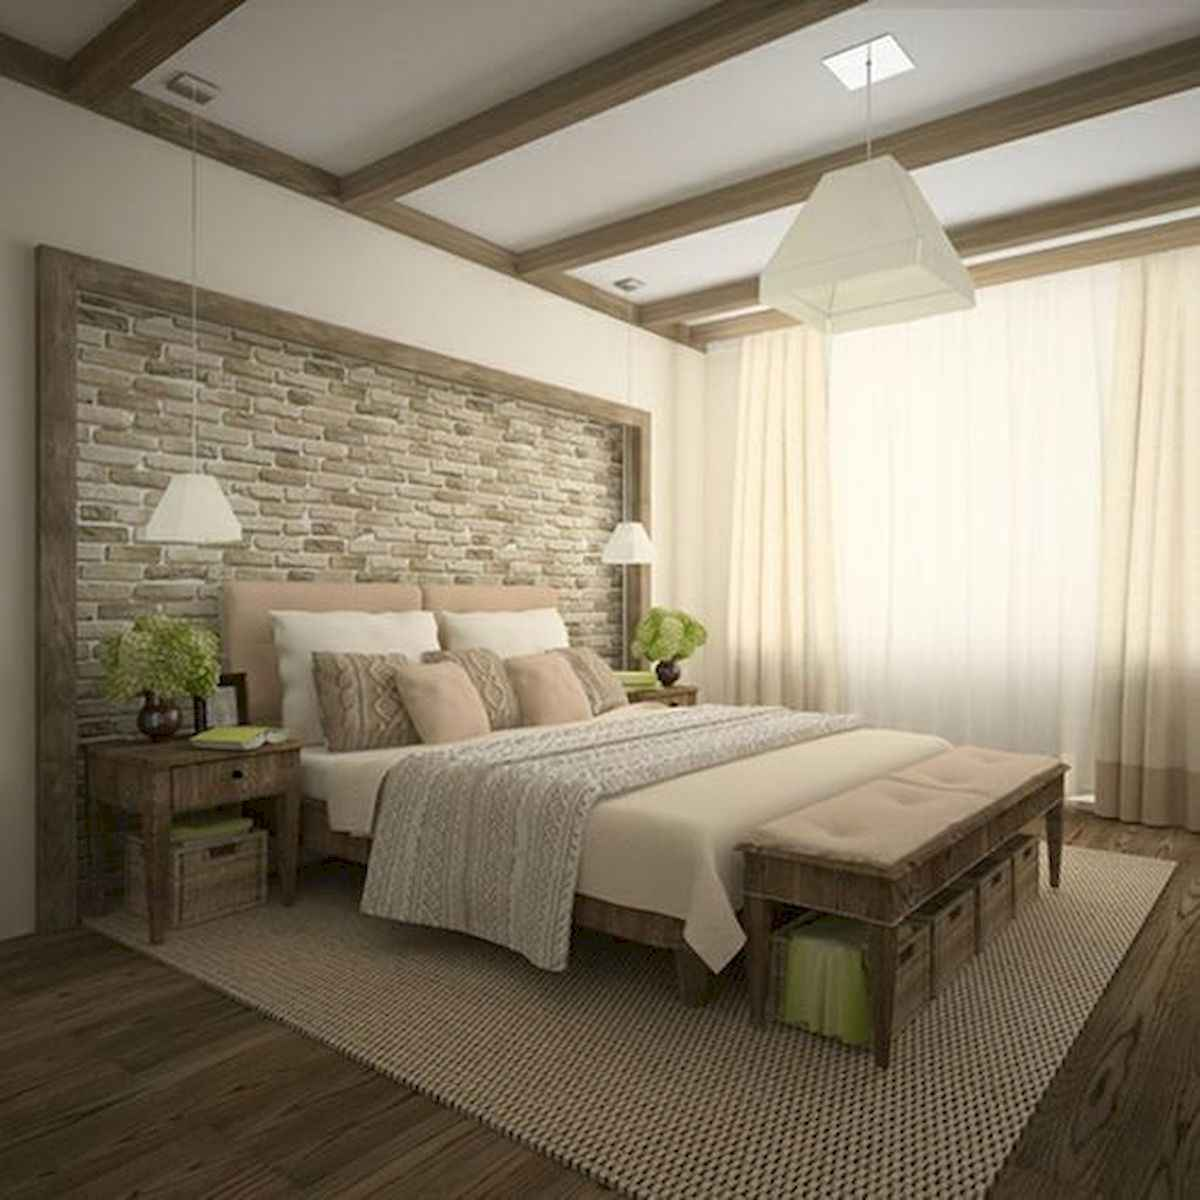 120 Awesome Farmhouse Master Bedroom Decor Ideas (4)